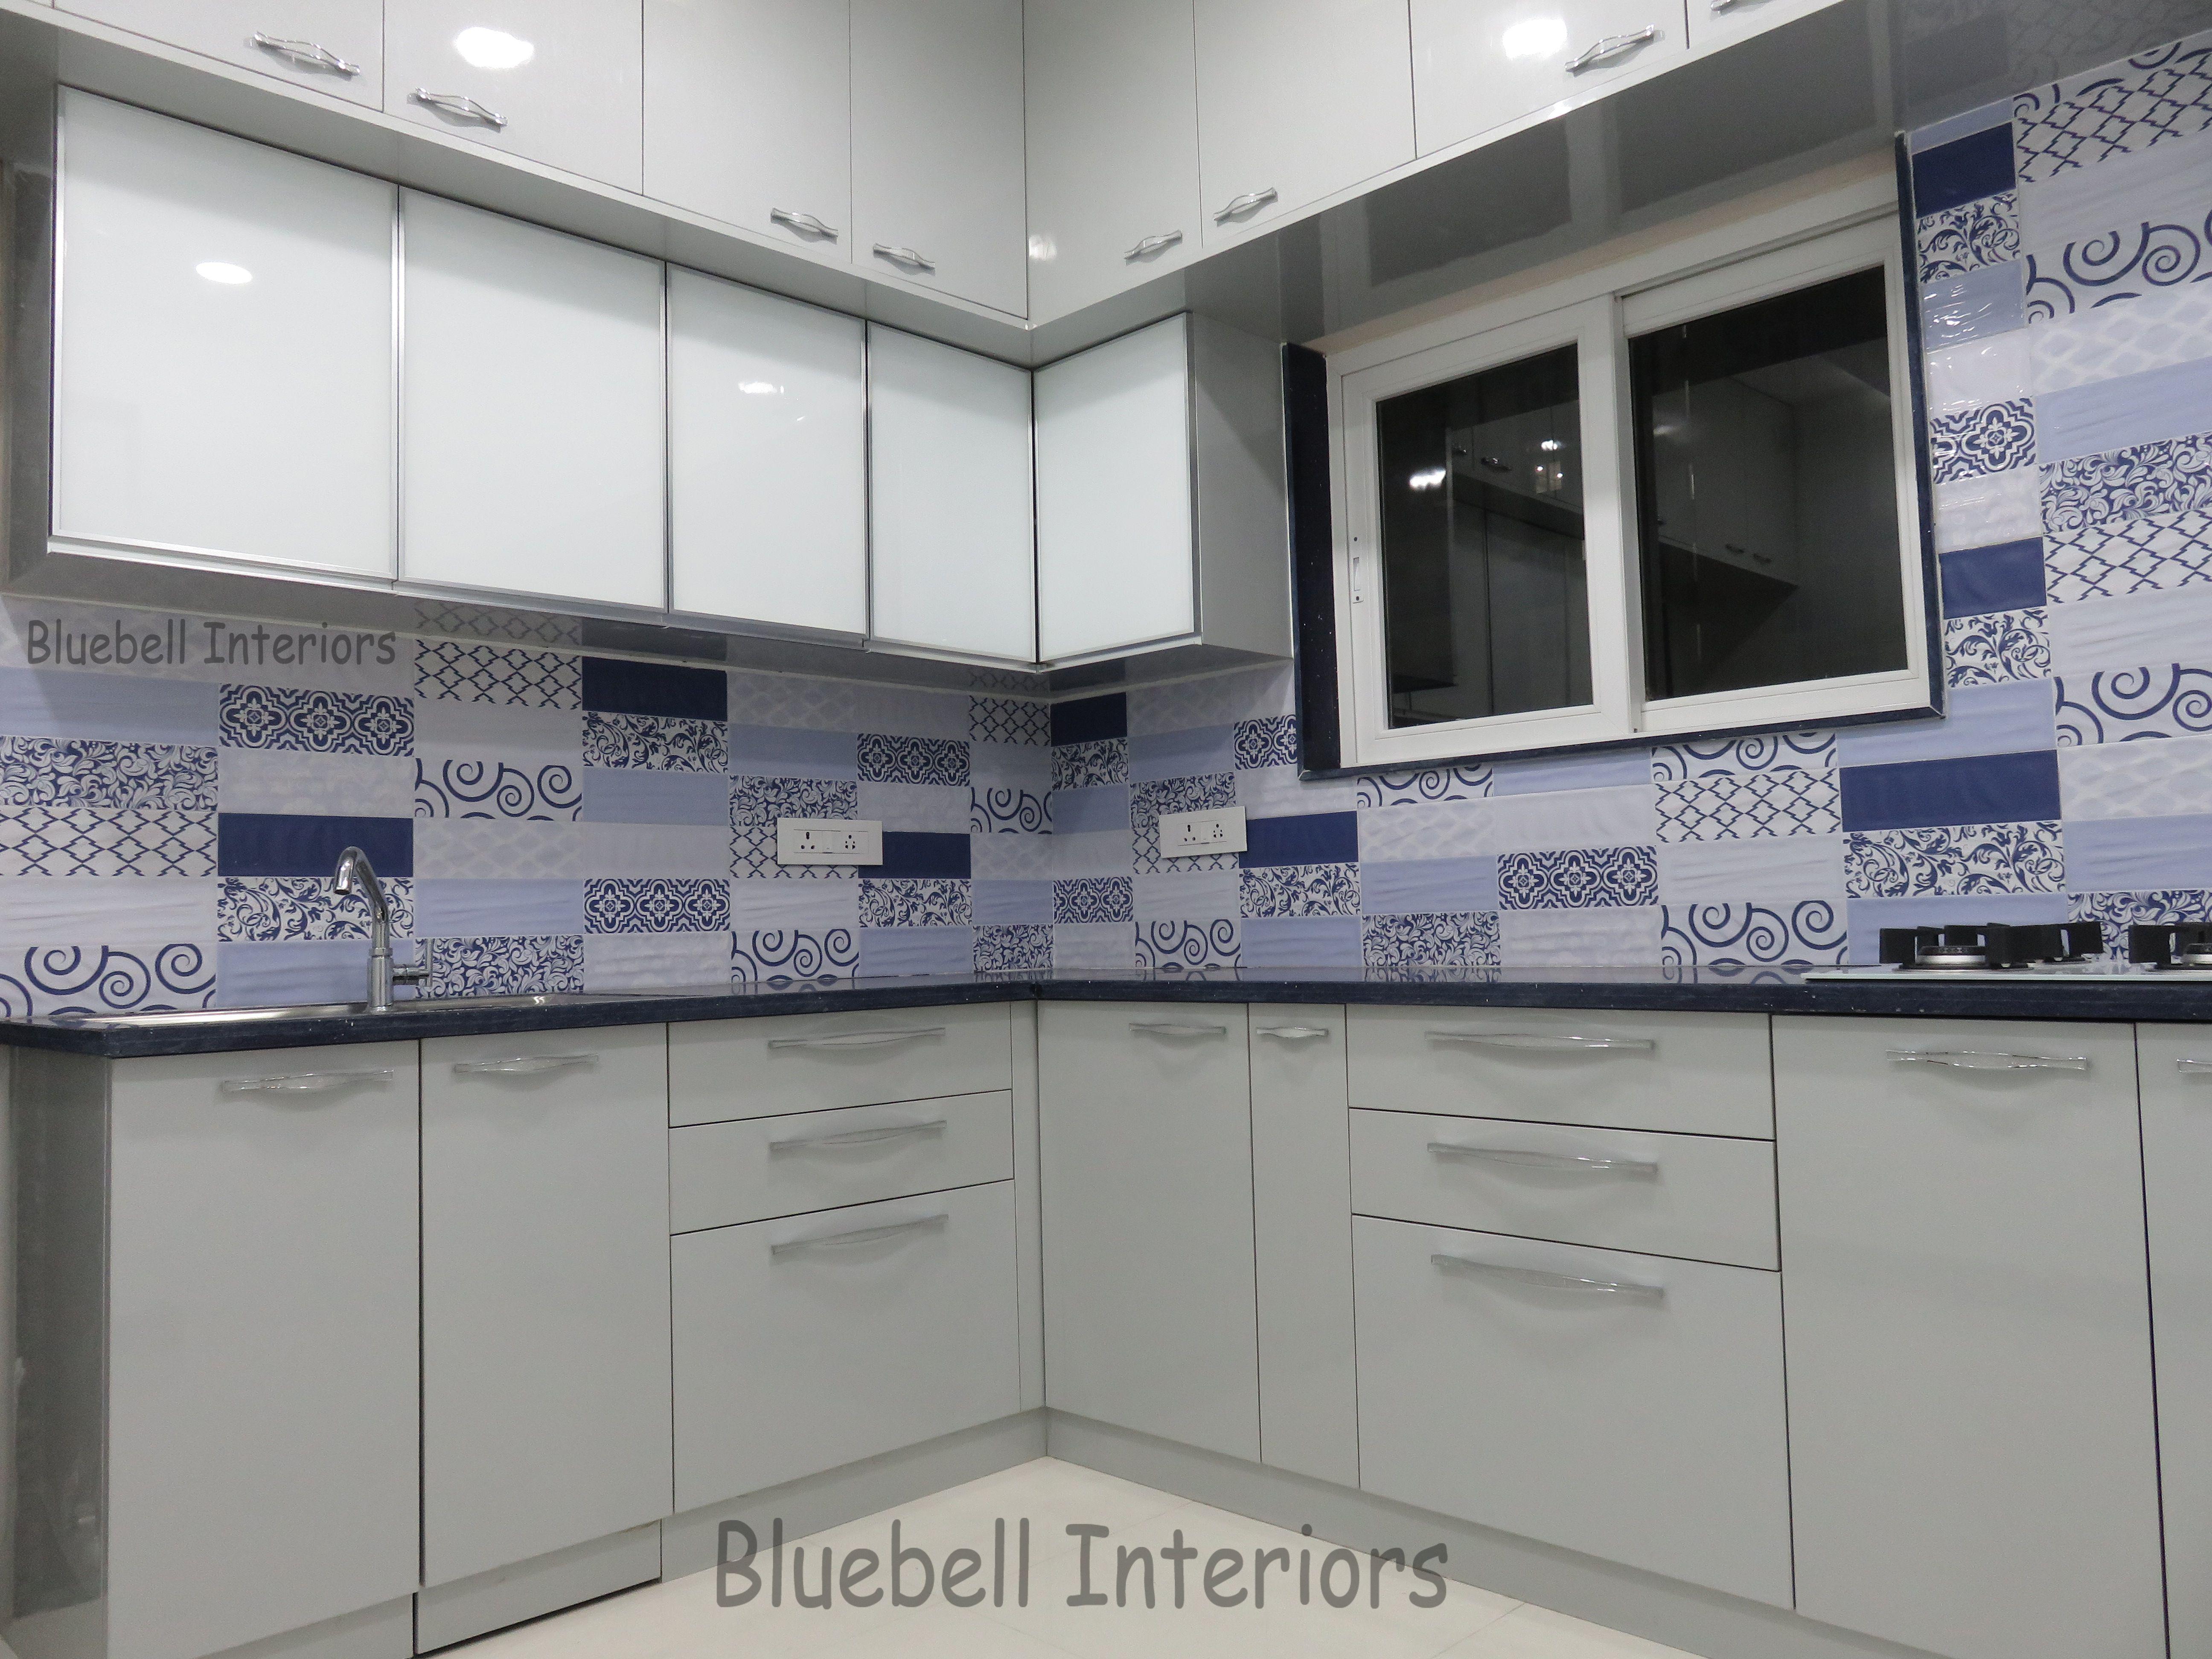 Grey Blue Modular Kitchen White Lacquered Glass Shutters Blue Dado Tiles Grey Acrylic Kitchen Modern Home Interior Design Kitchen Design House Interior